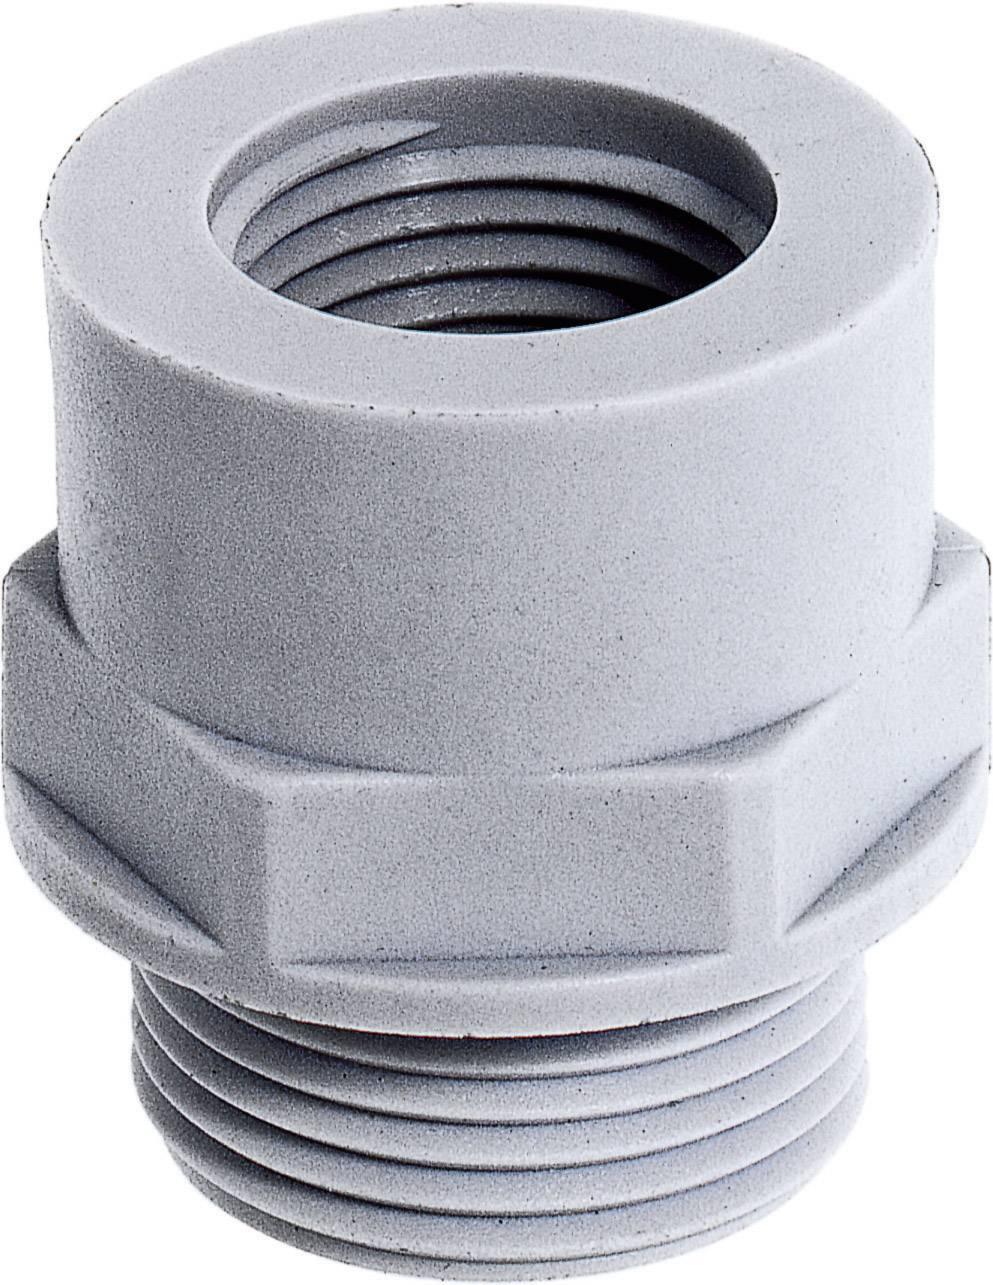 Rozšírenie káblovej priechodky LappKabel SKINDICHT EKU-M 12x1,5/16x1,5, polyamid, 1 ks